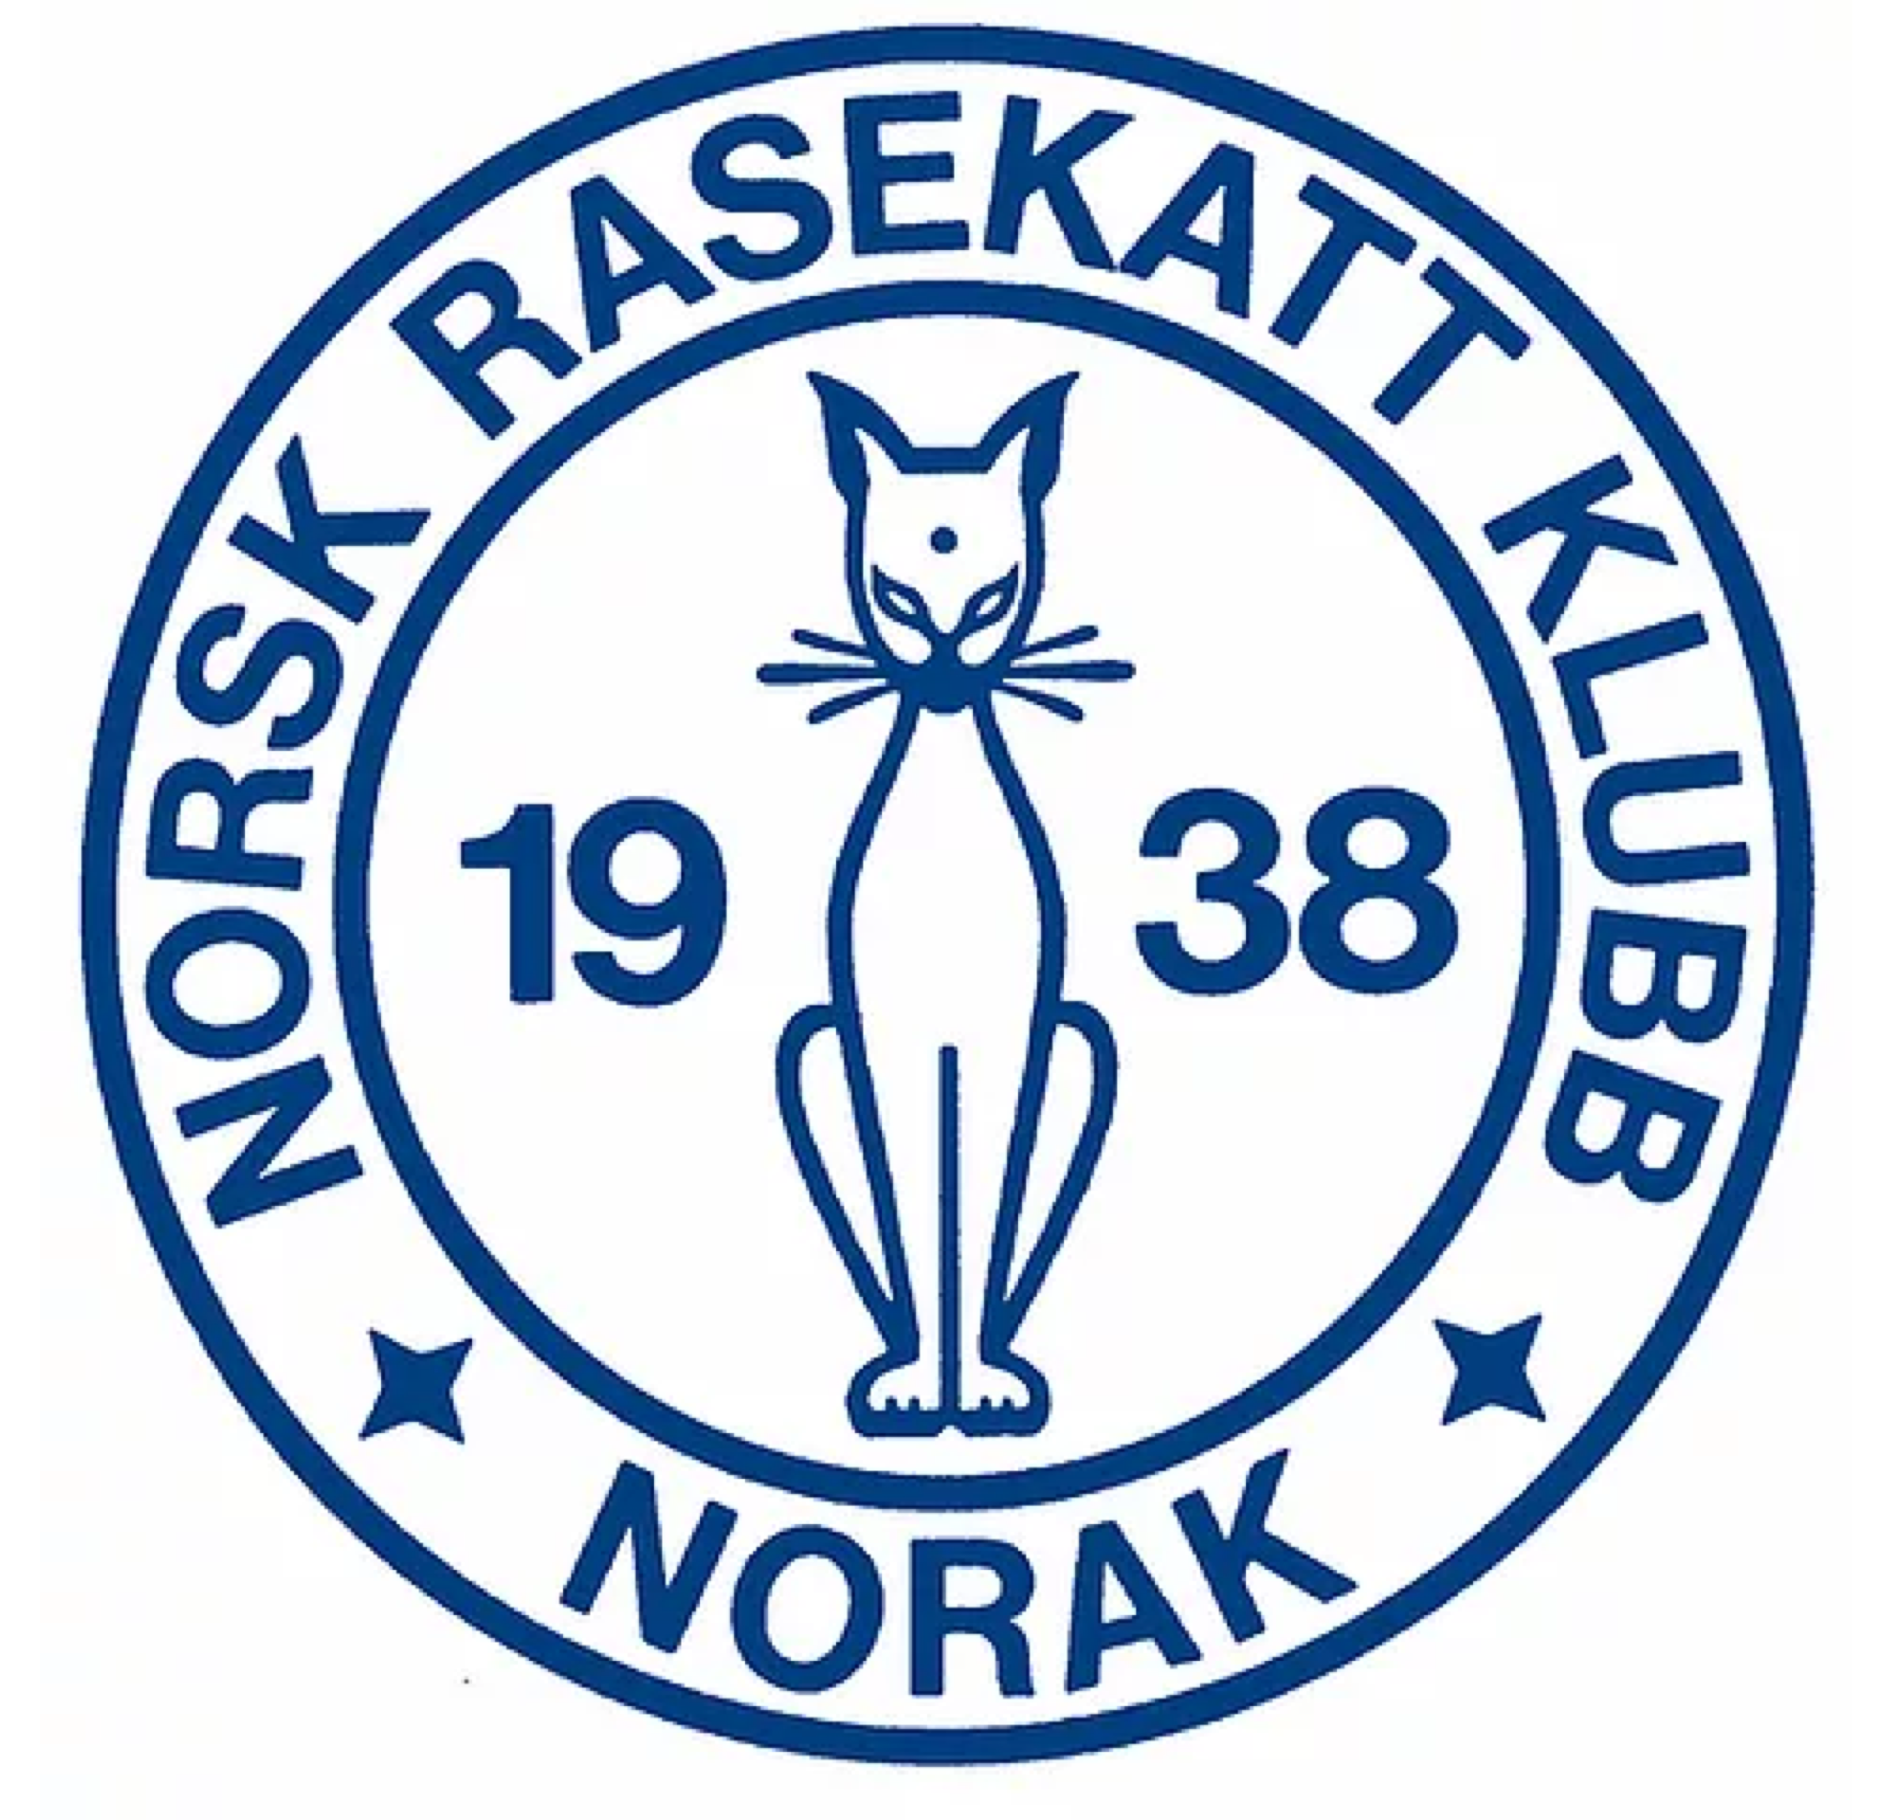 NORAK